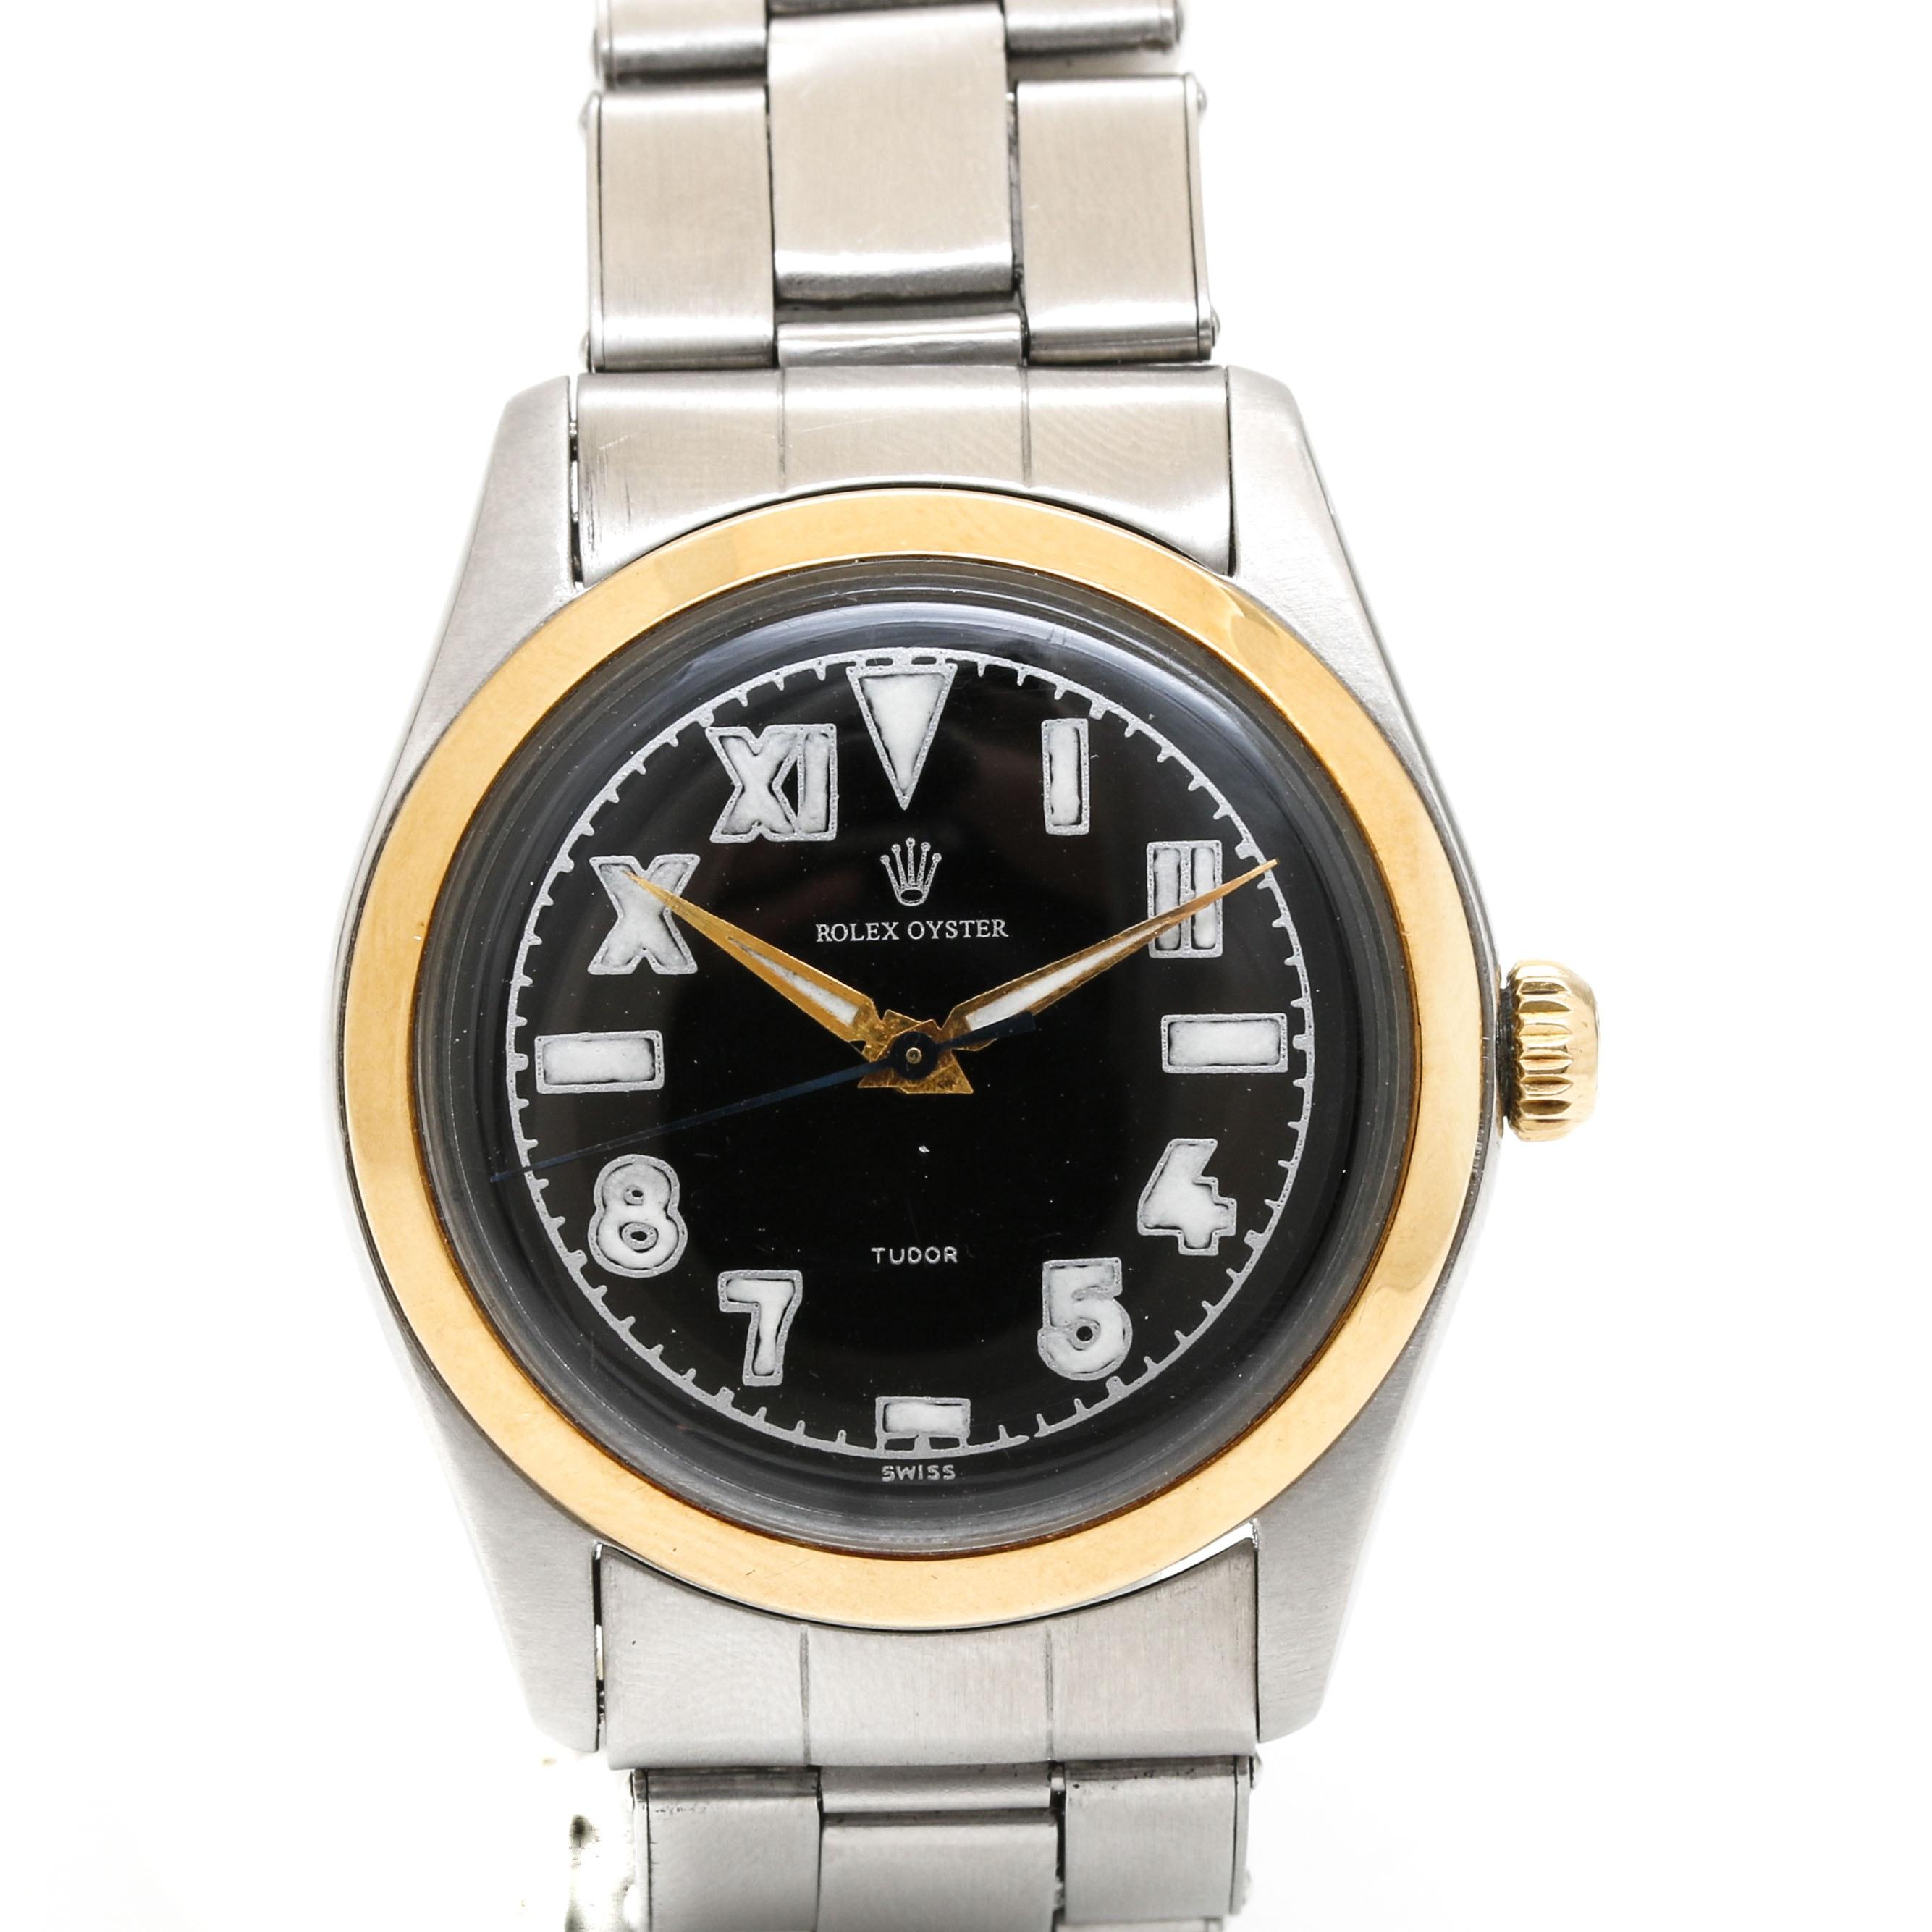 Rolex Oyster Stainless Steel Wristwatch